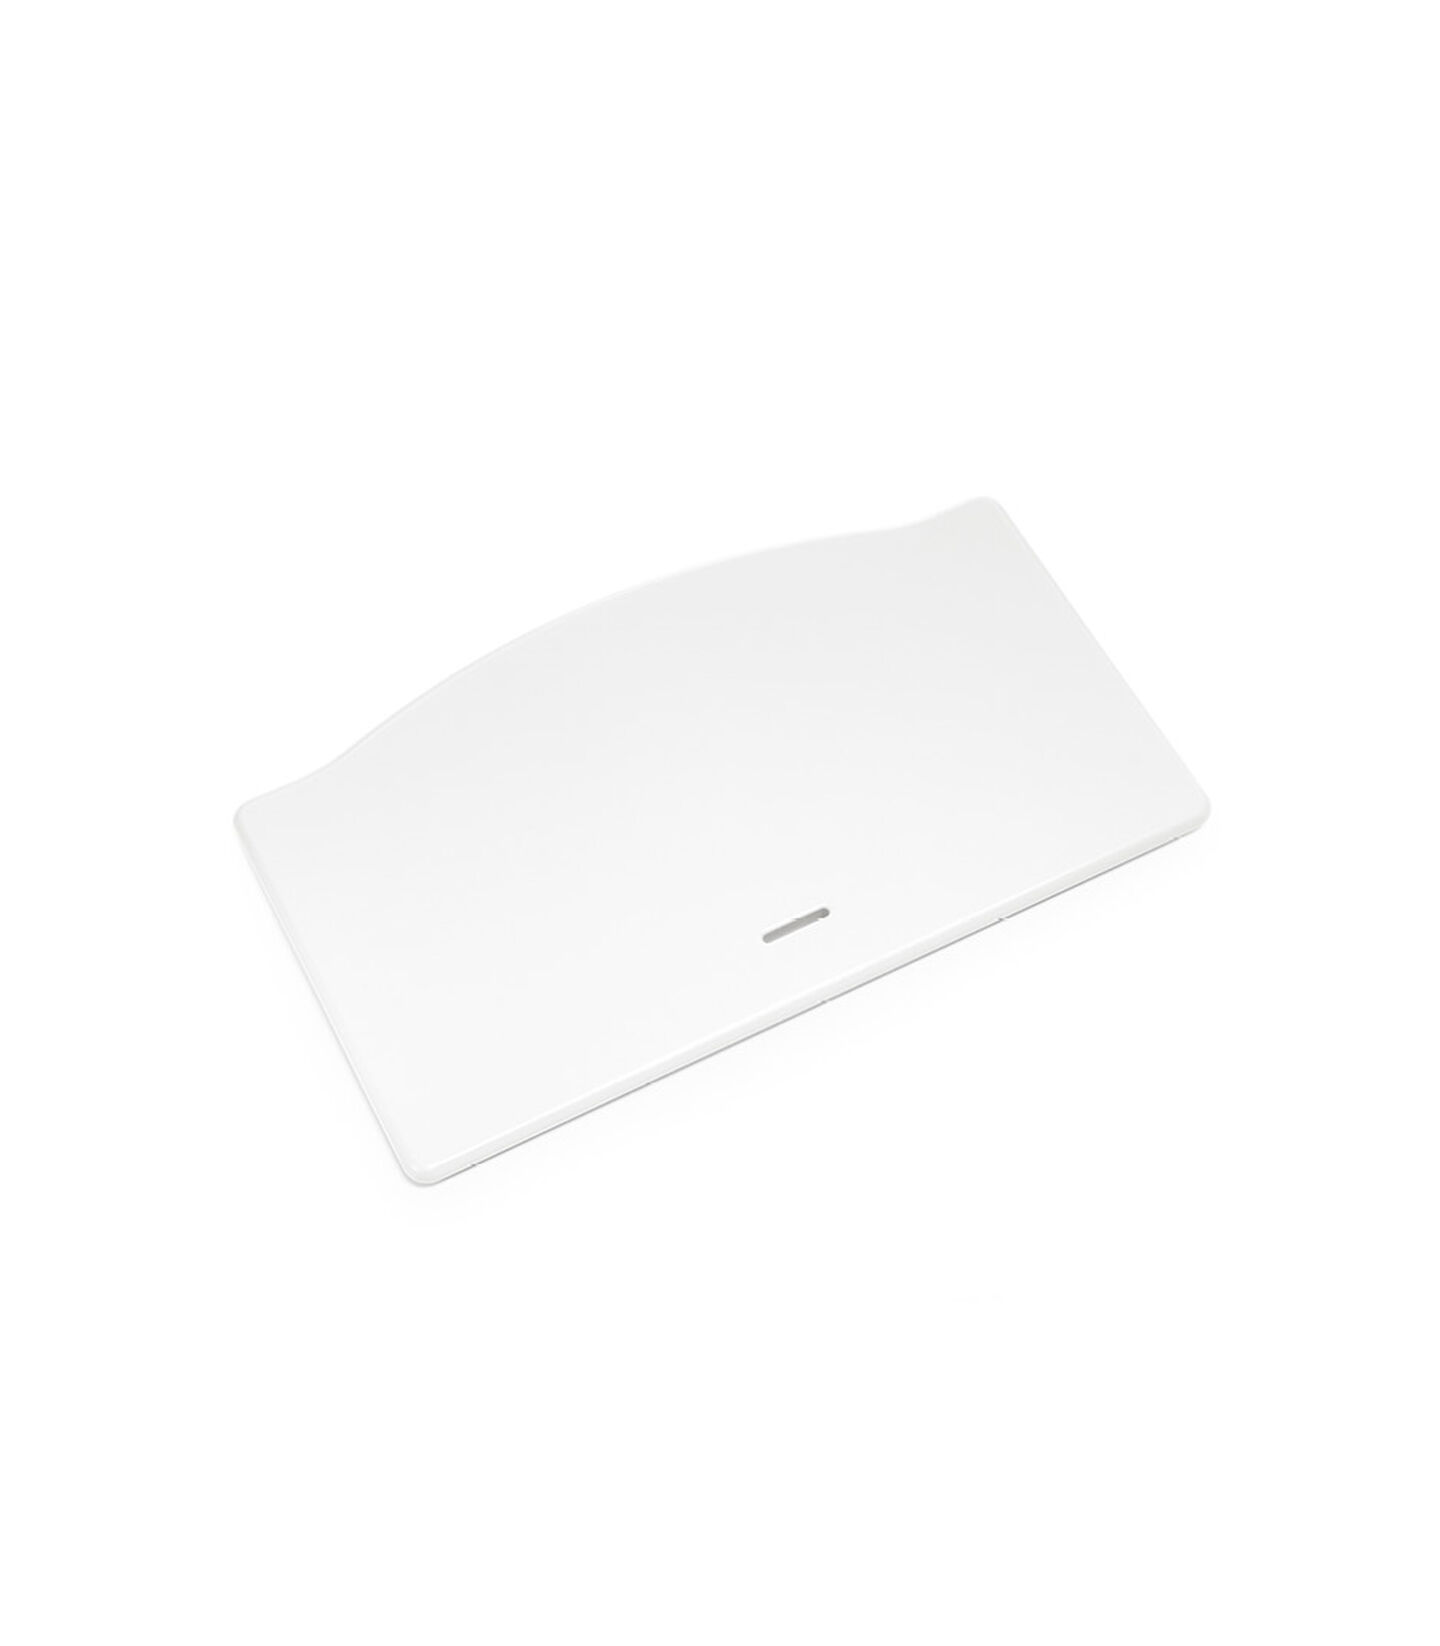 Tripp Trapp® Sitzplatte White, White, mainview view 2